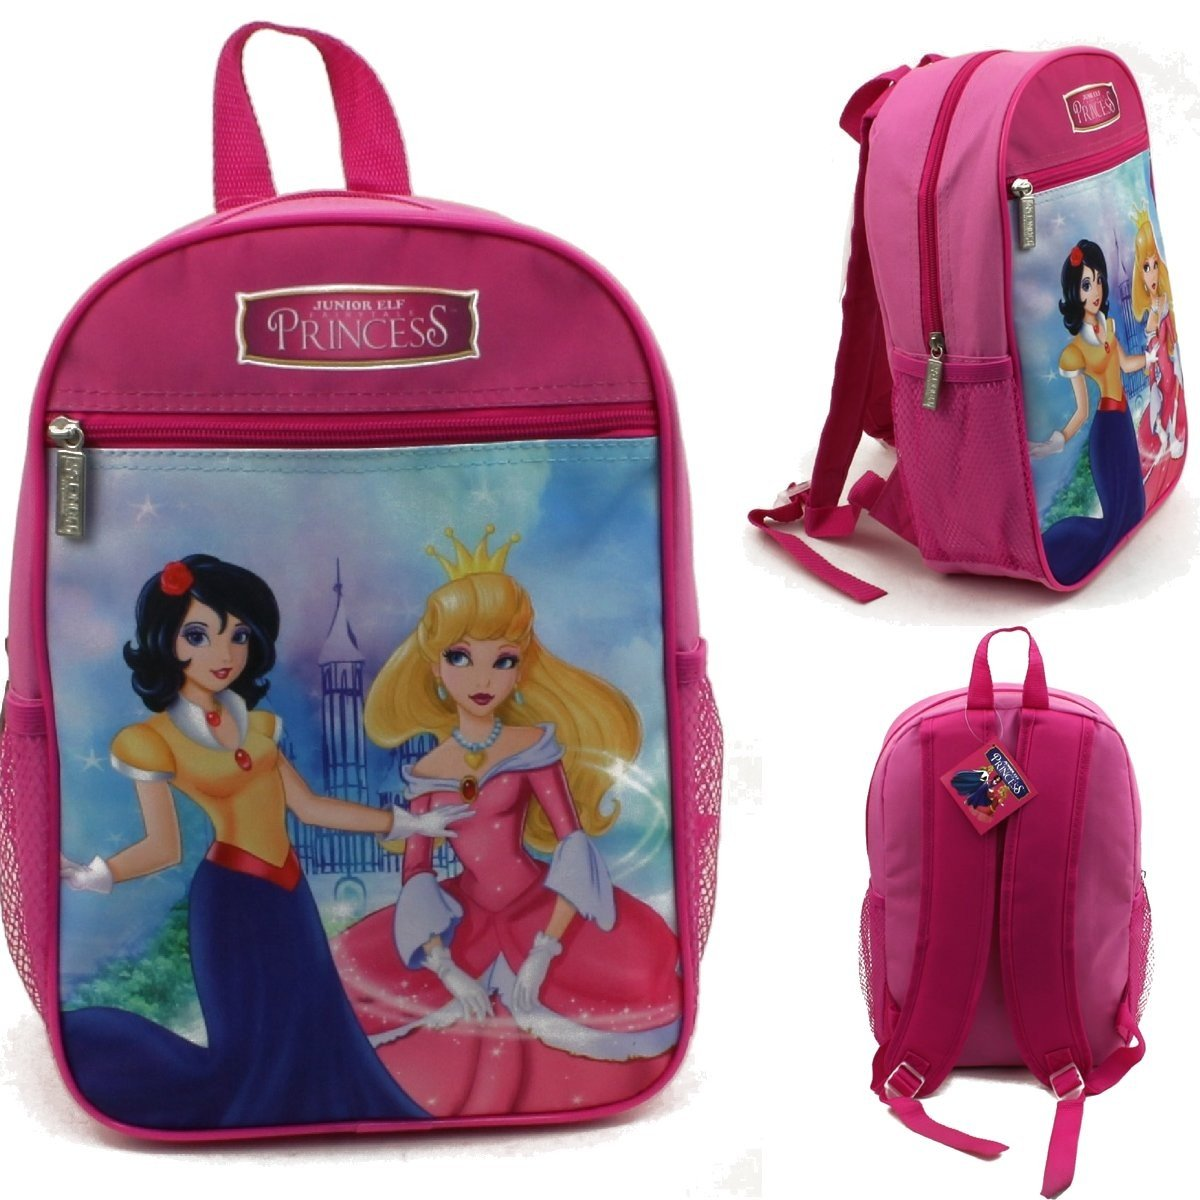 13'' Wholesale Junior Elf Princess Backpack - Case of 24